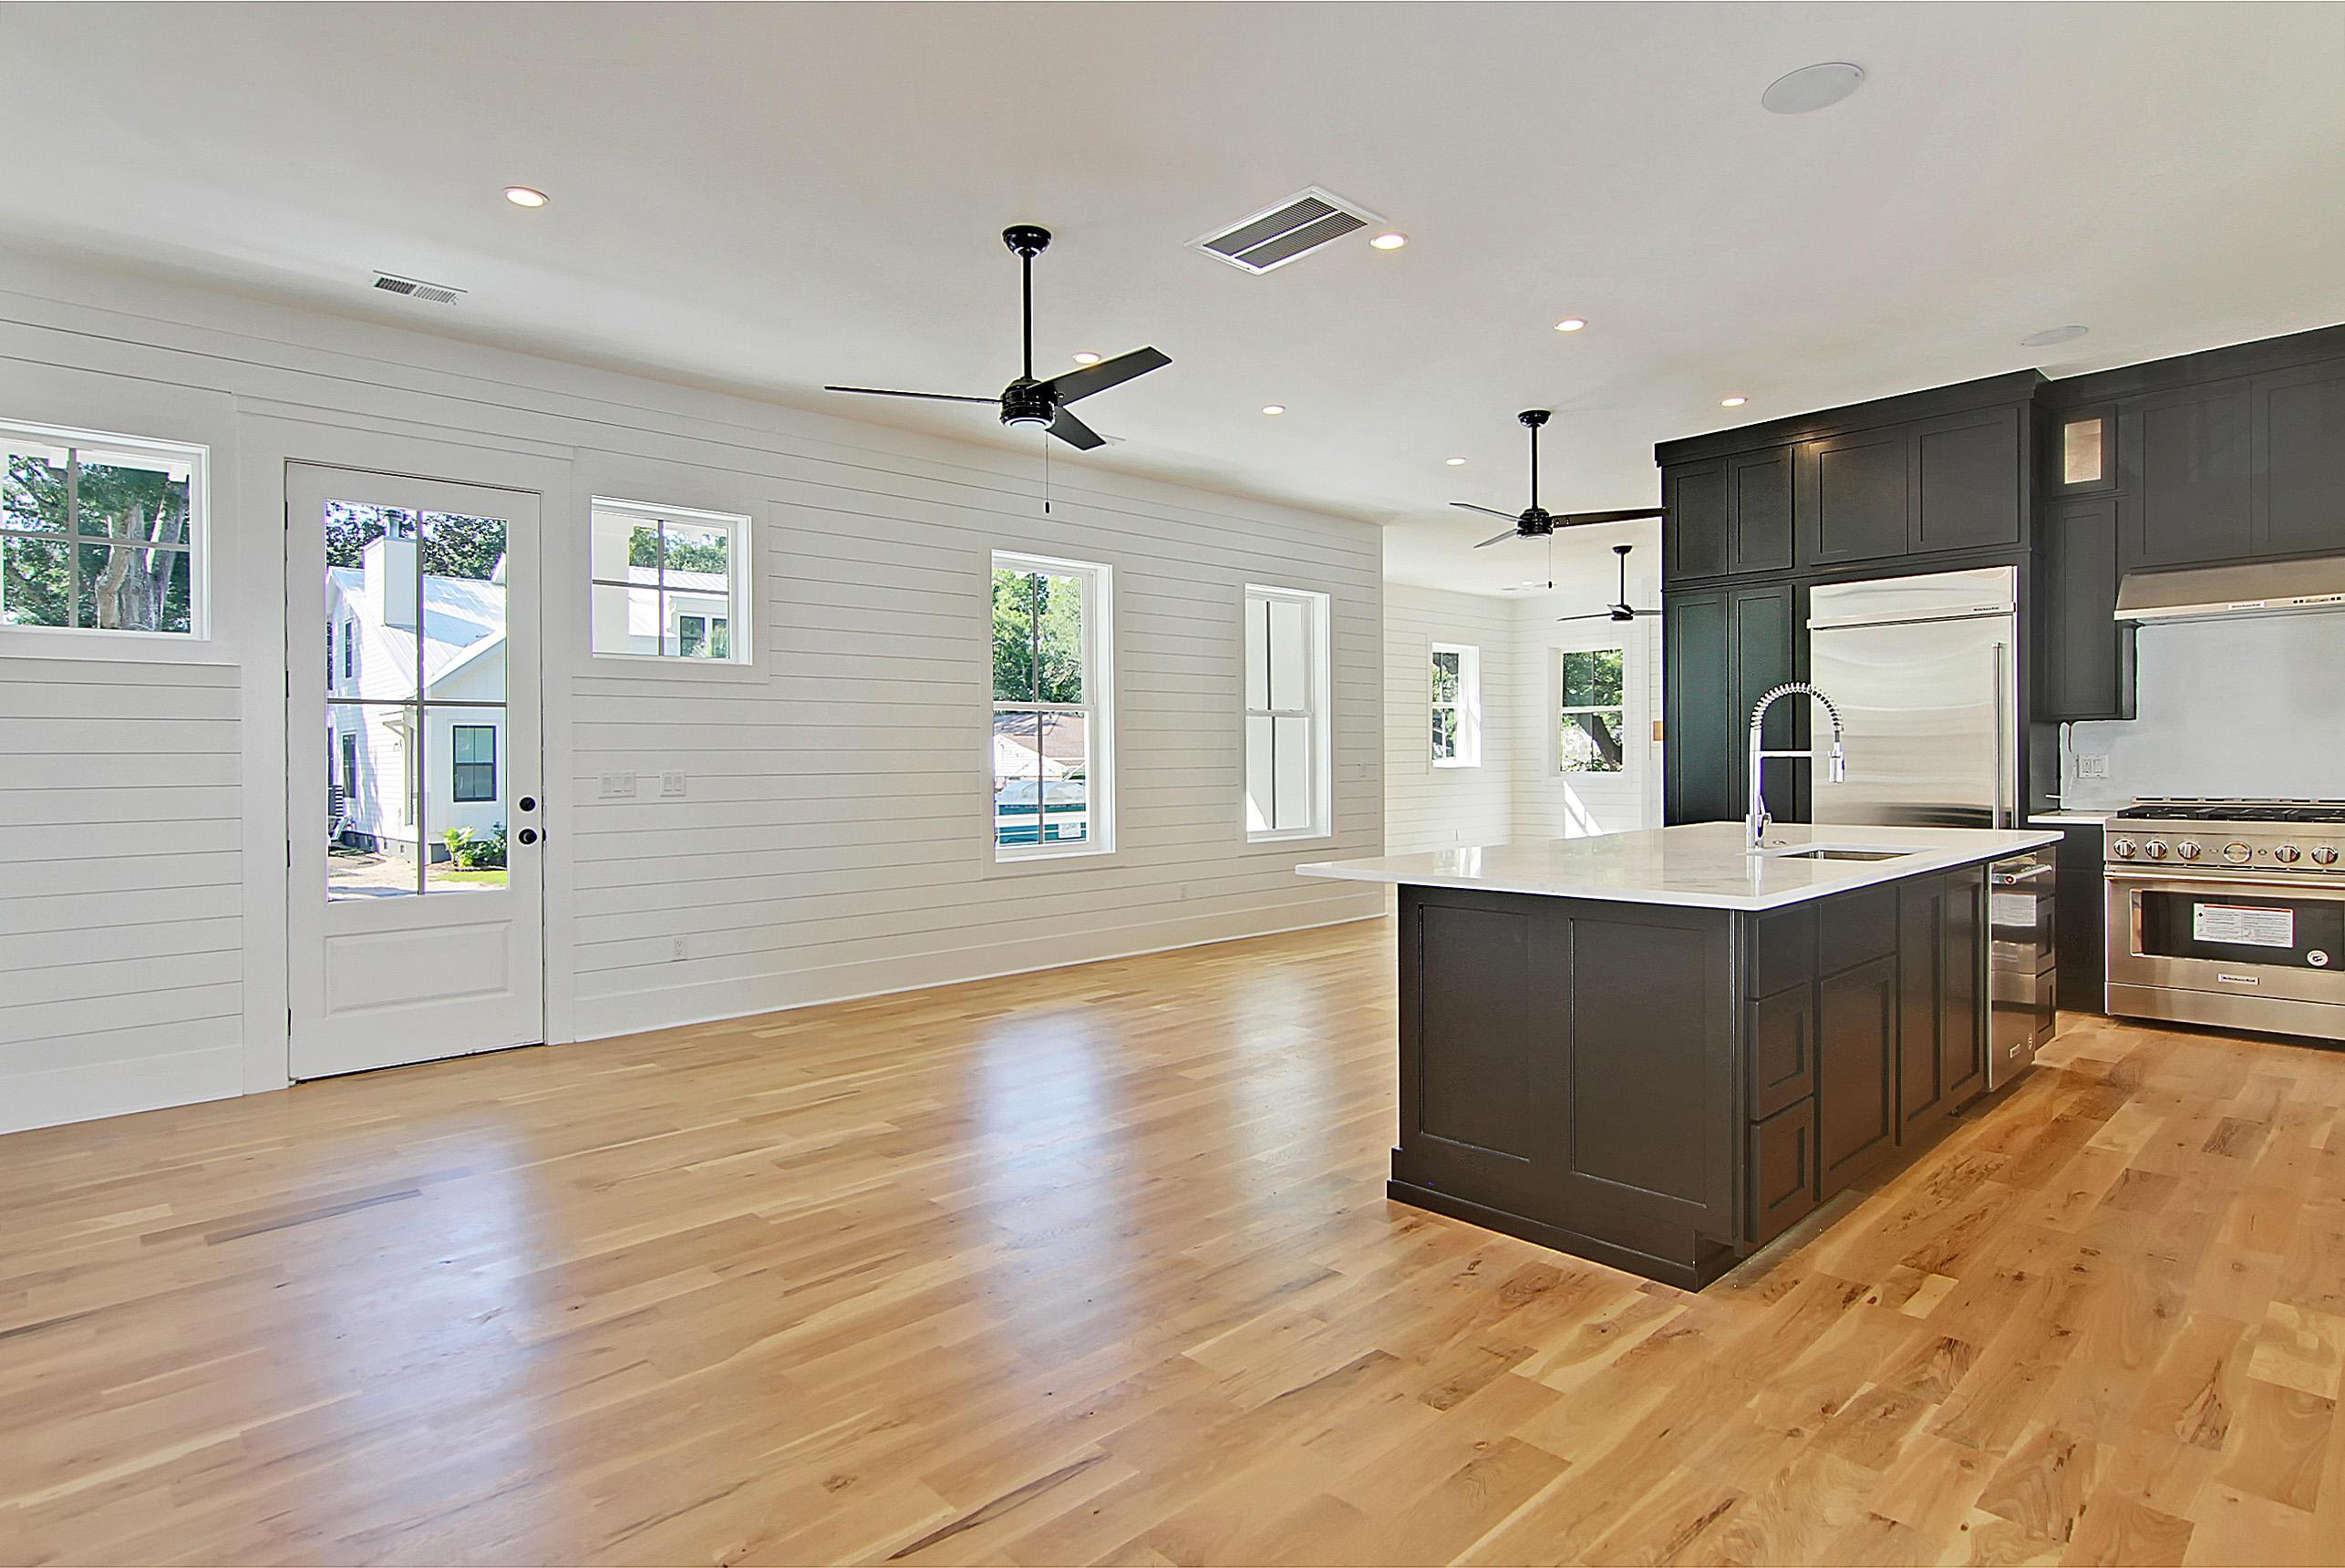 Old Mt Pleasant Homes For Sale - 733 Atlantic, Mount Pleasant, SC - 50